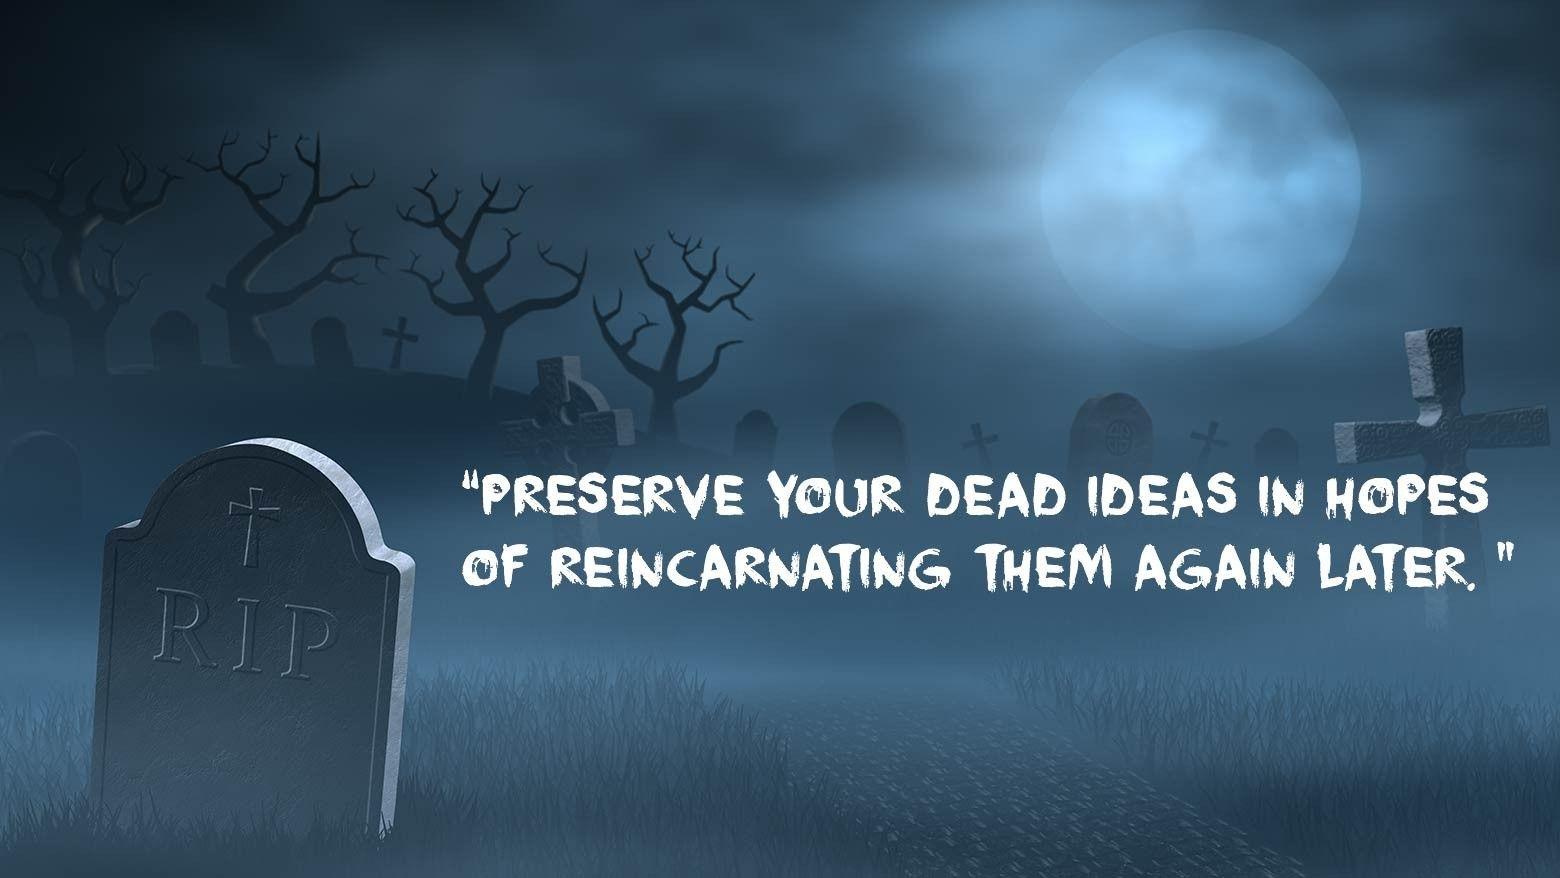 Design Graveyard: Harvesting Your Dead Ideas